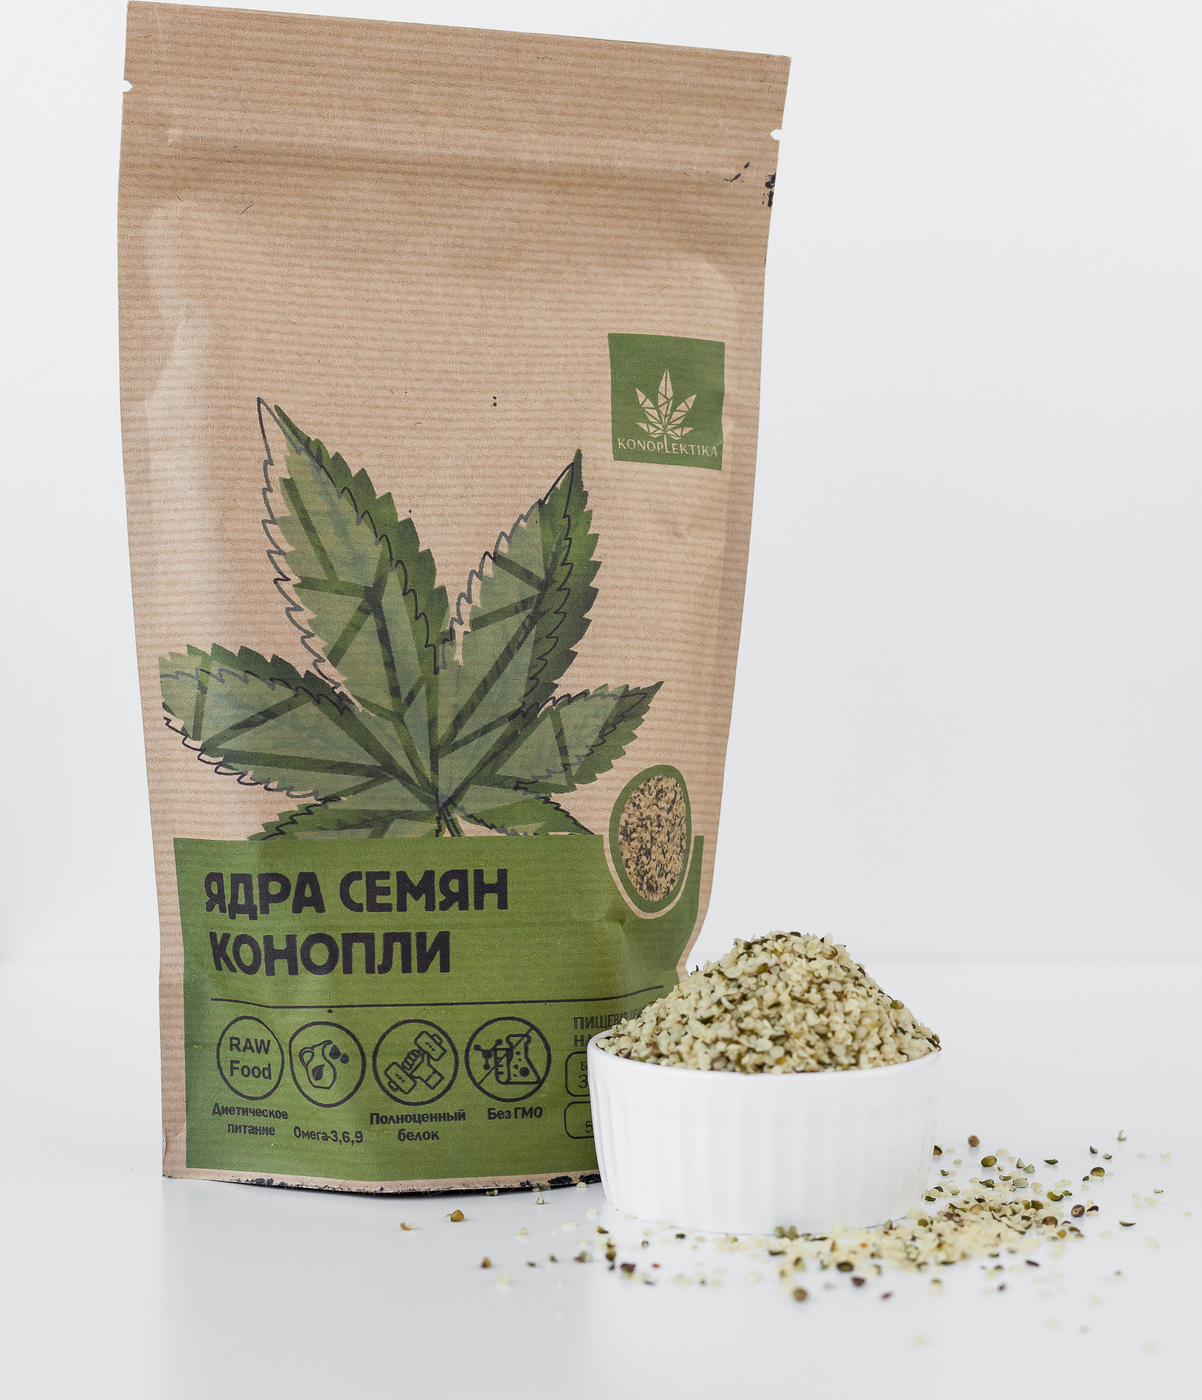 Конопля без семян фото марихуаны